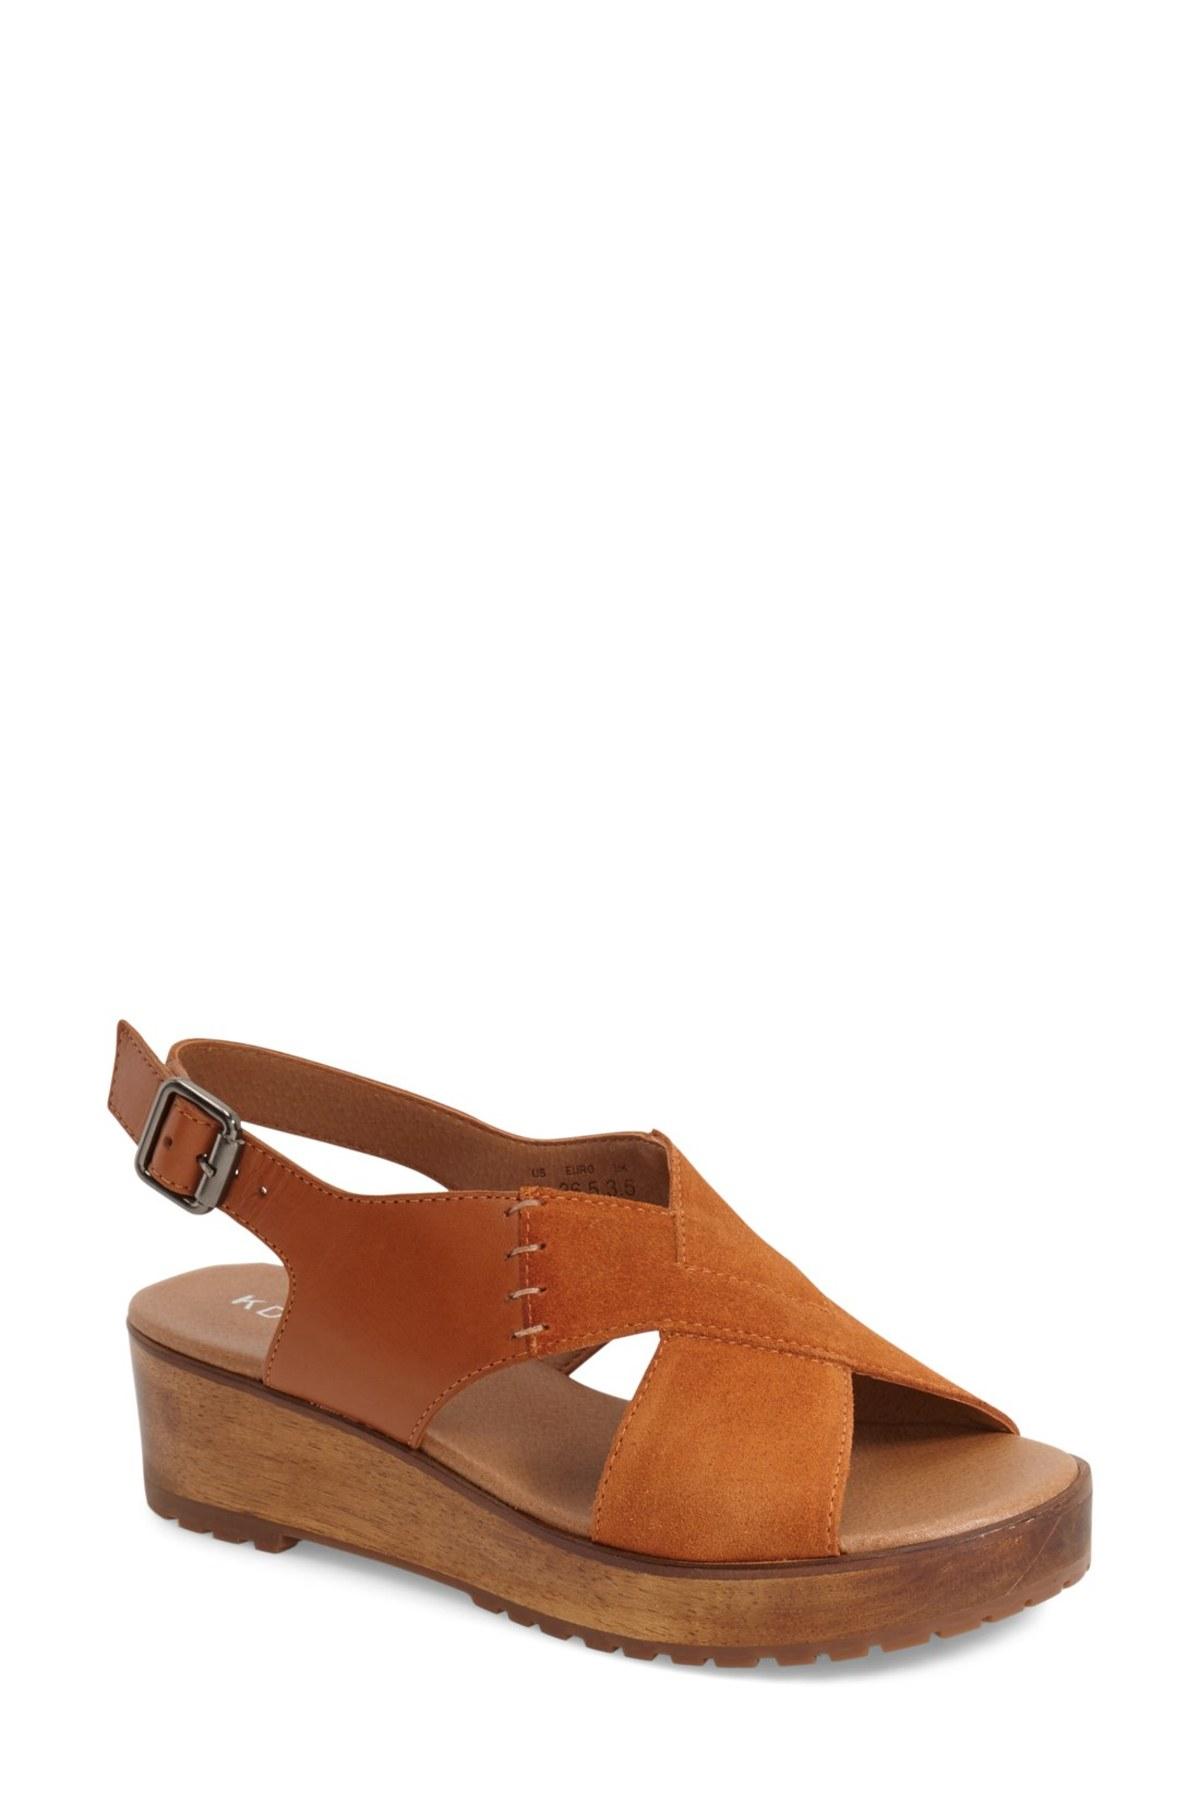 9ebab47e2672 Lyst - Kelsi Dagger Brooklyn  danielle Wood  Platform Sandal (women ...